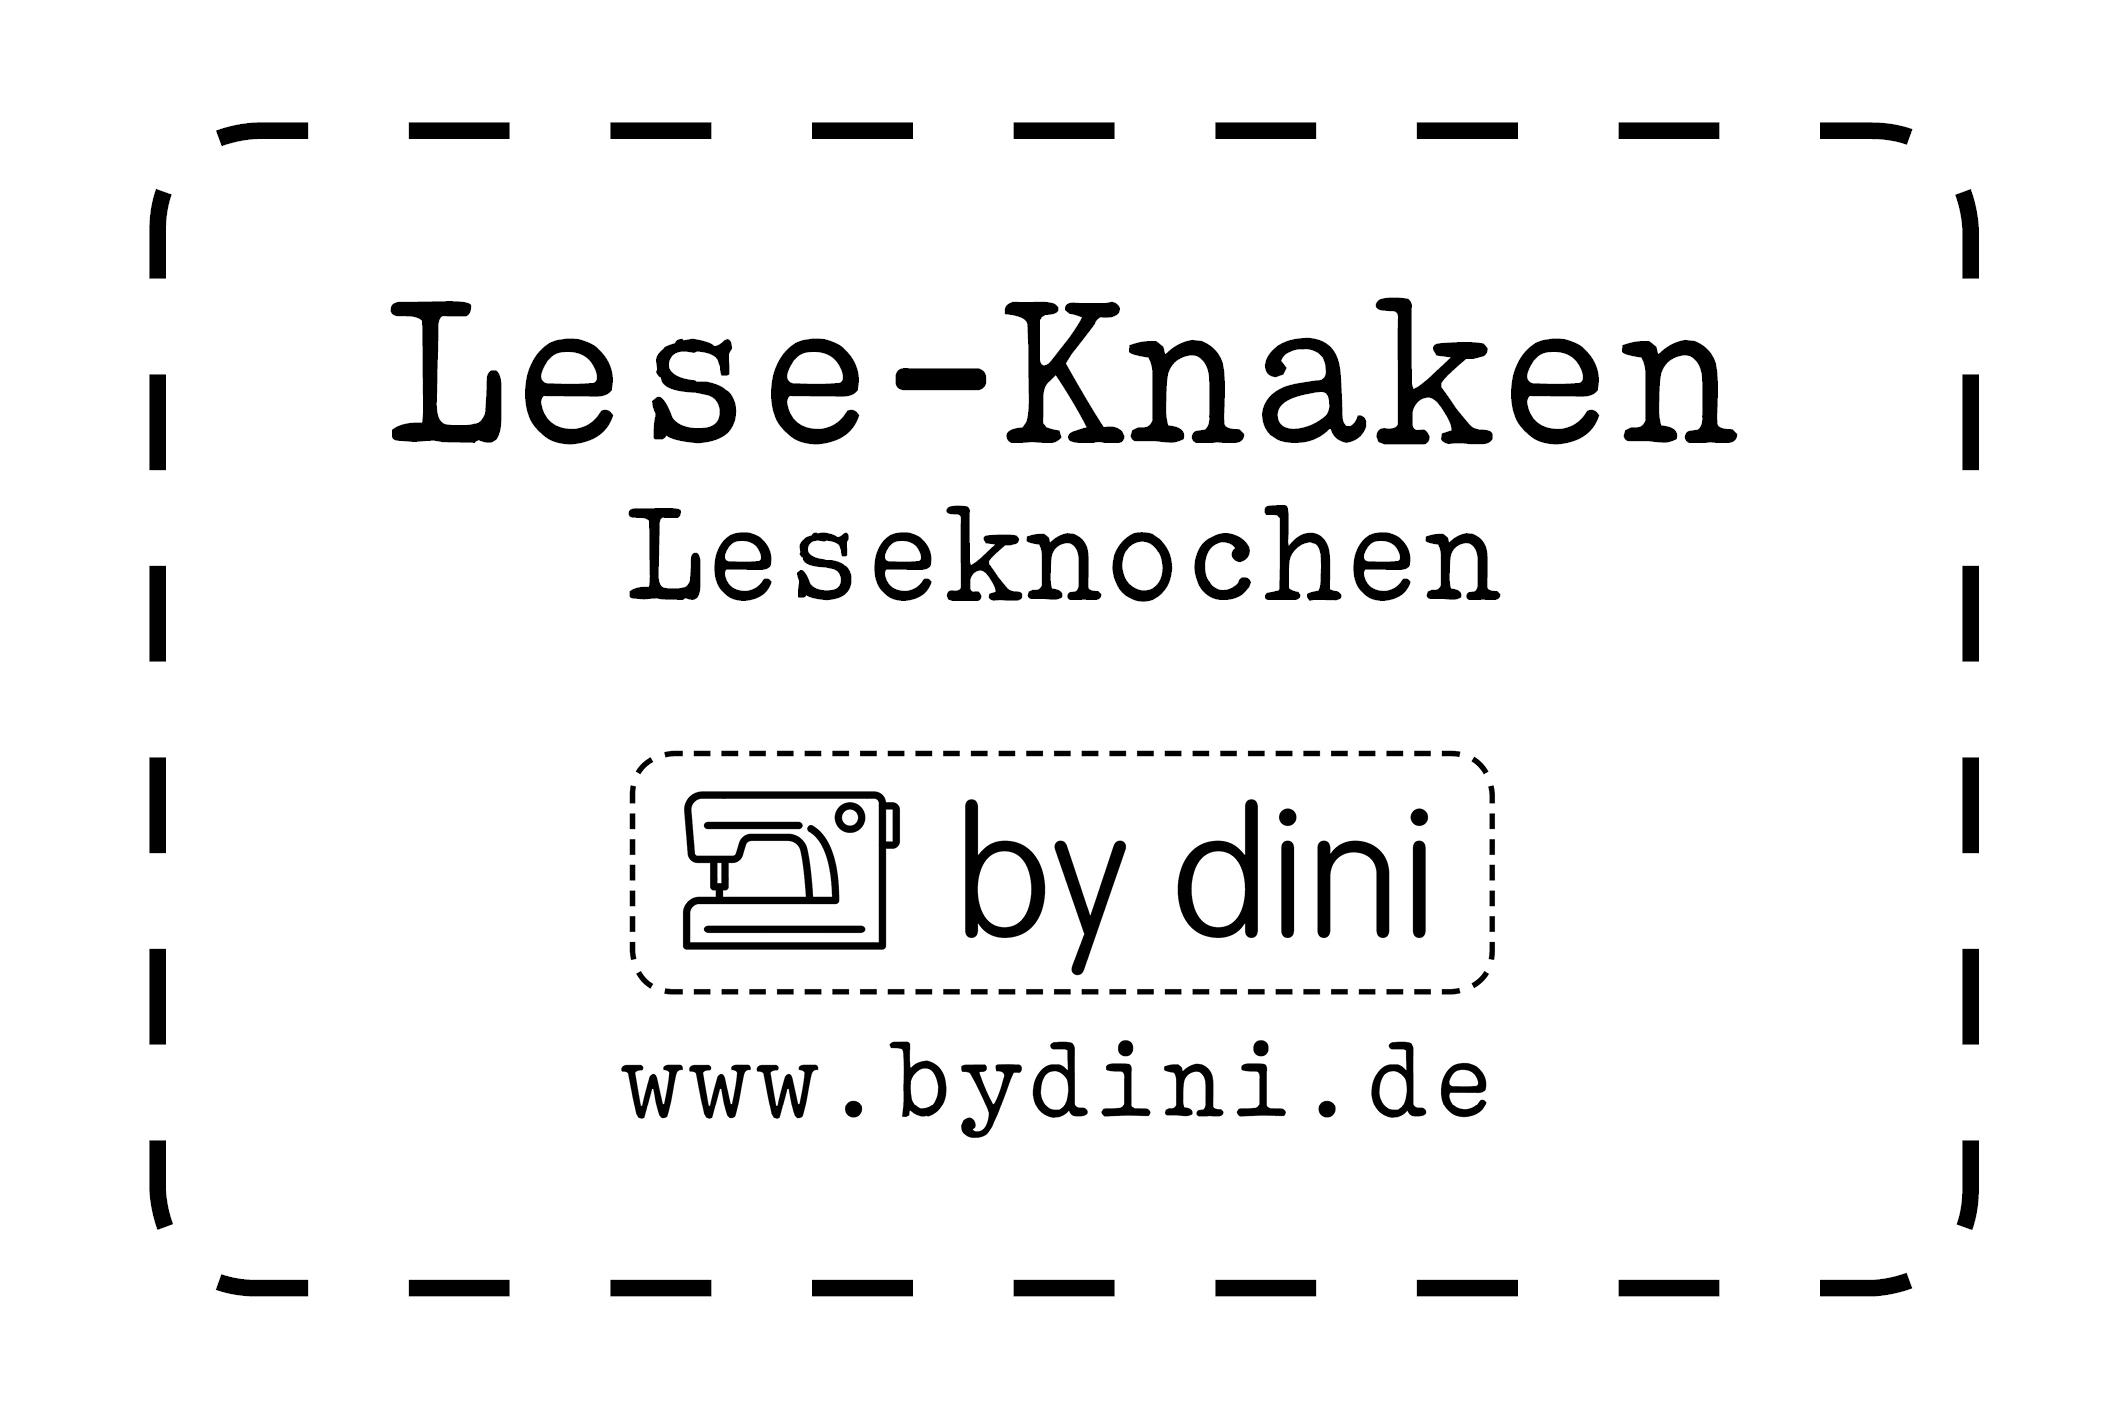 #Büdel #bydini #dini #Ashausen #Selbstgenäht #Nadine_Bürger